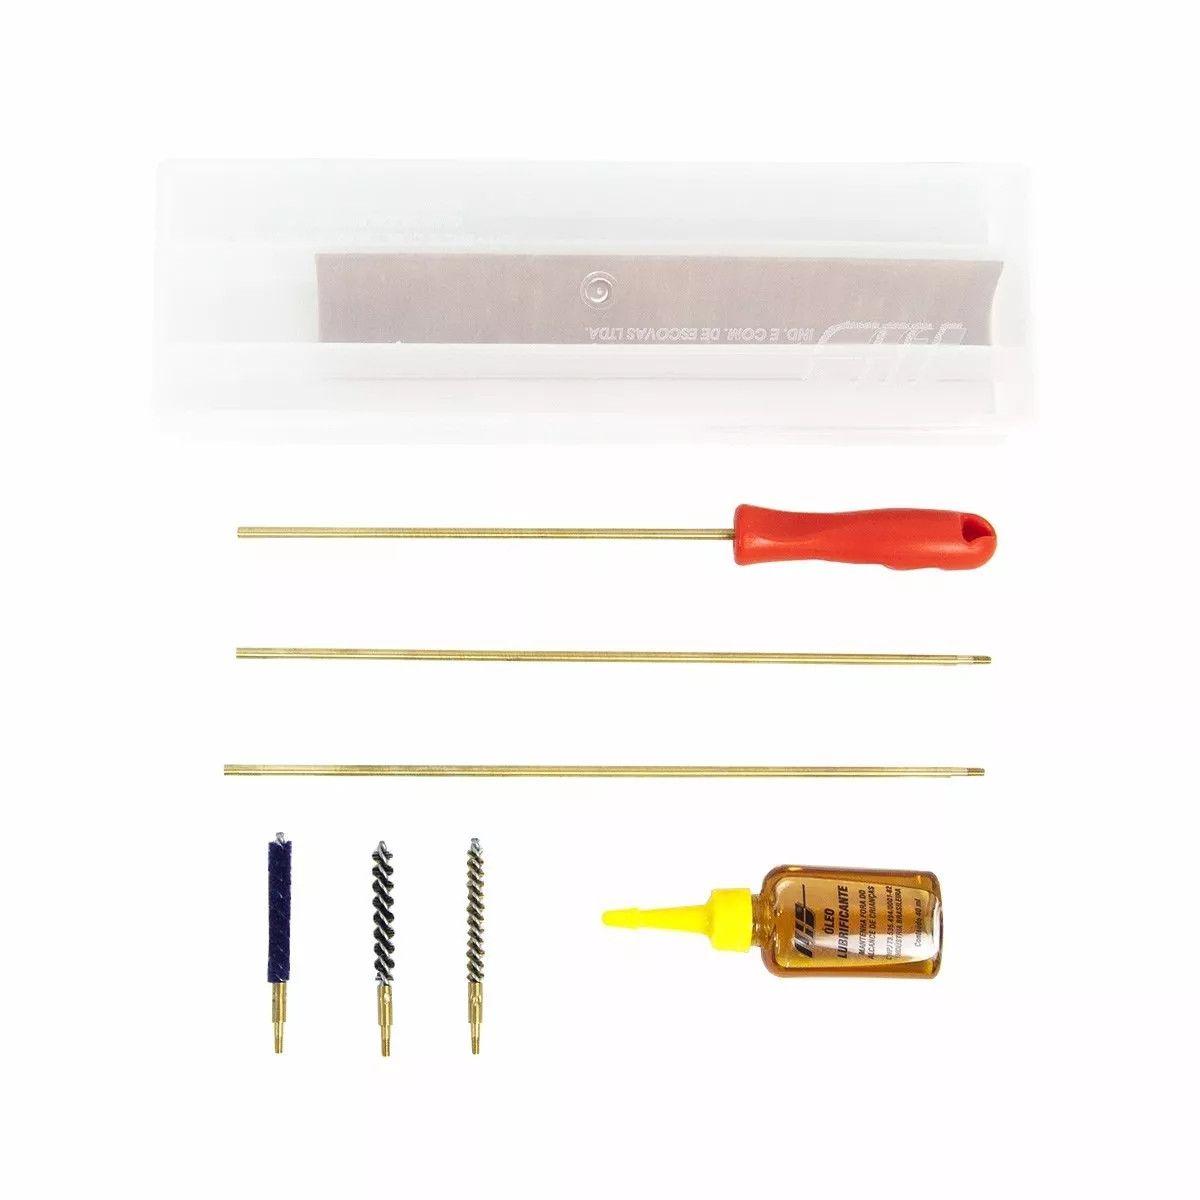 Kit Limpeza Lh Carabina/Pistola De Pressão 5,5mm